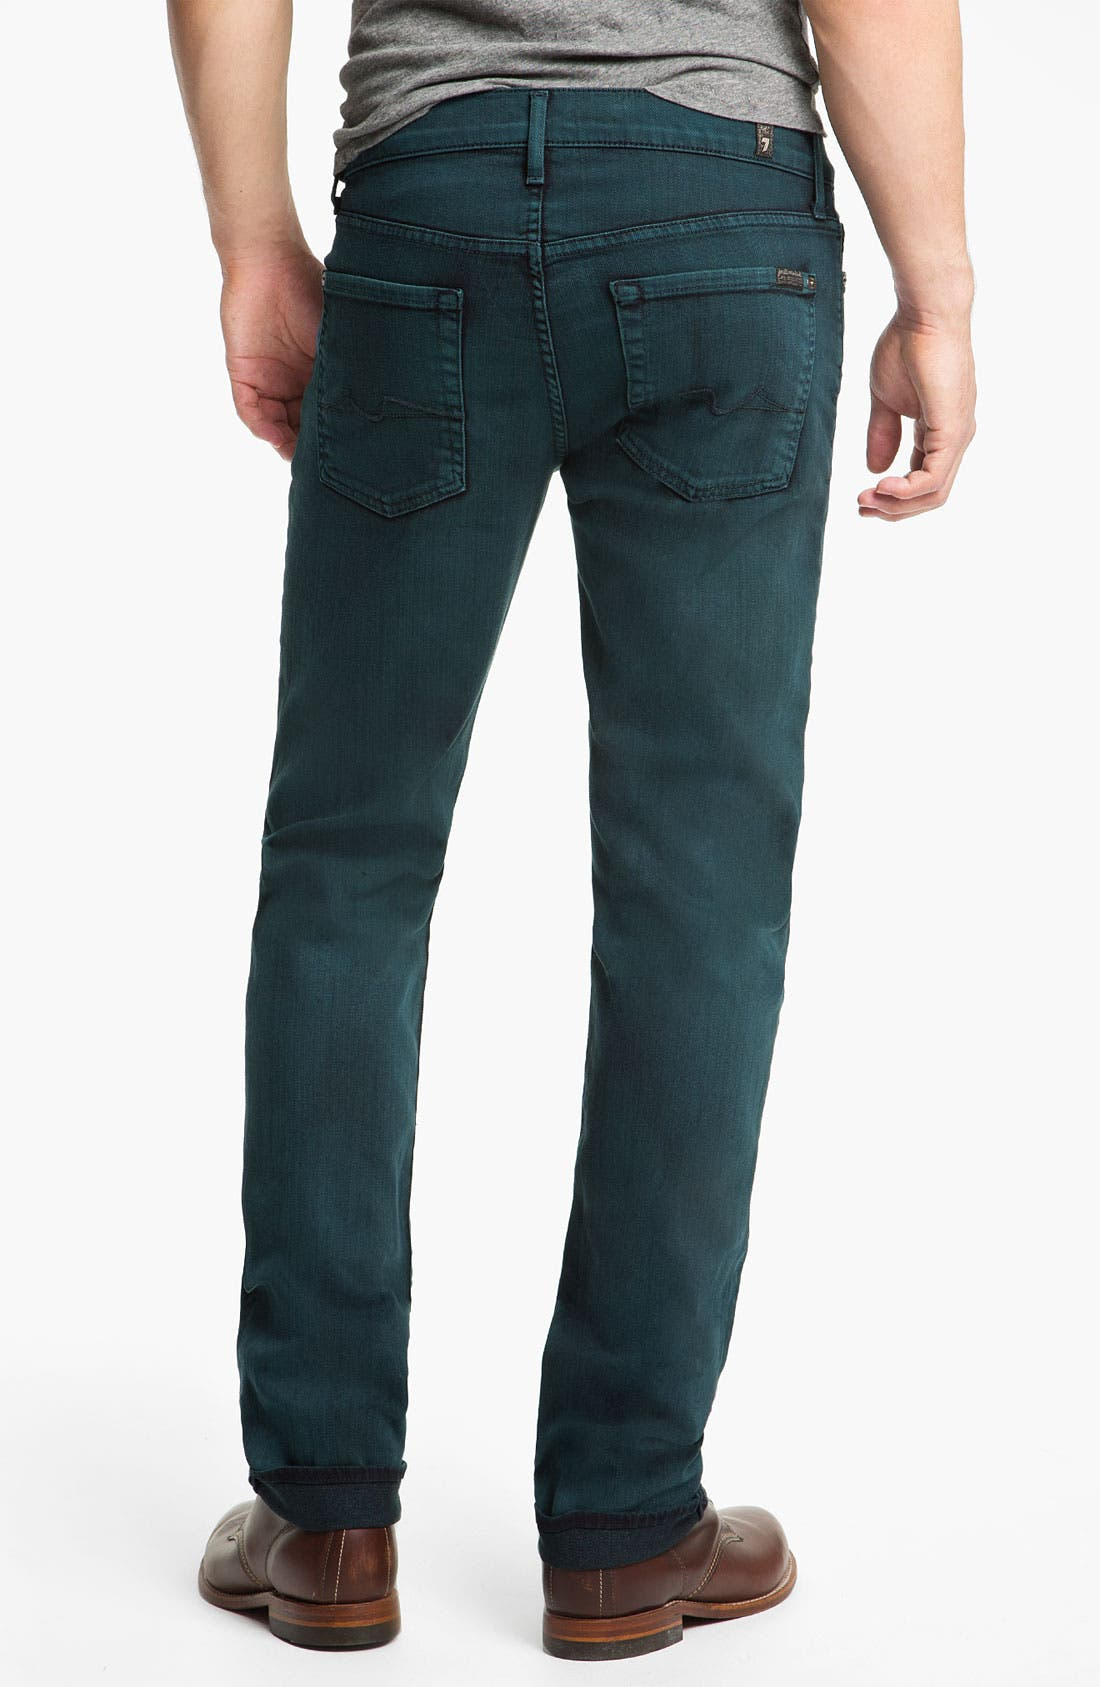 Alternate Image 1 Selected - 7 For All Mankind® 'Slimmy' Slim Straight Leg Jeans (Dark Ivy)